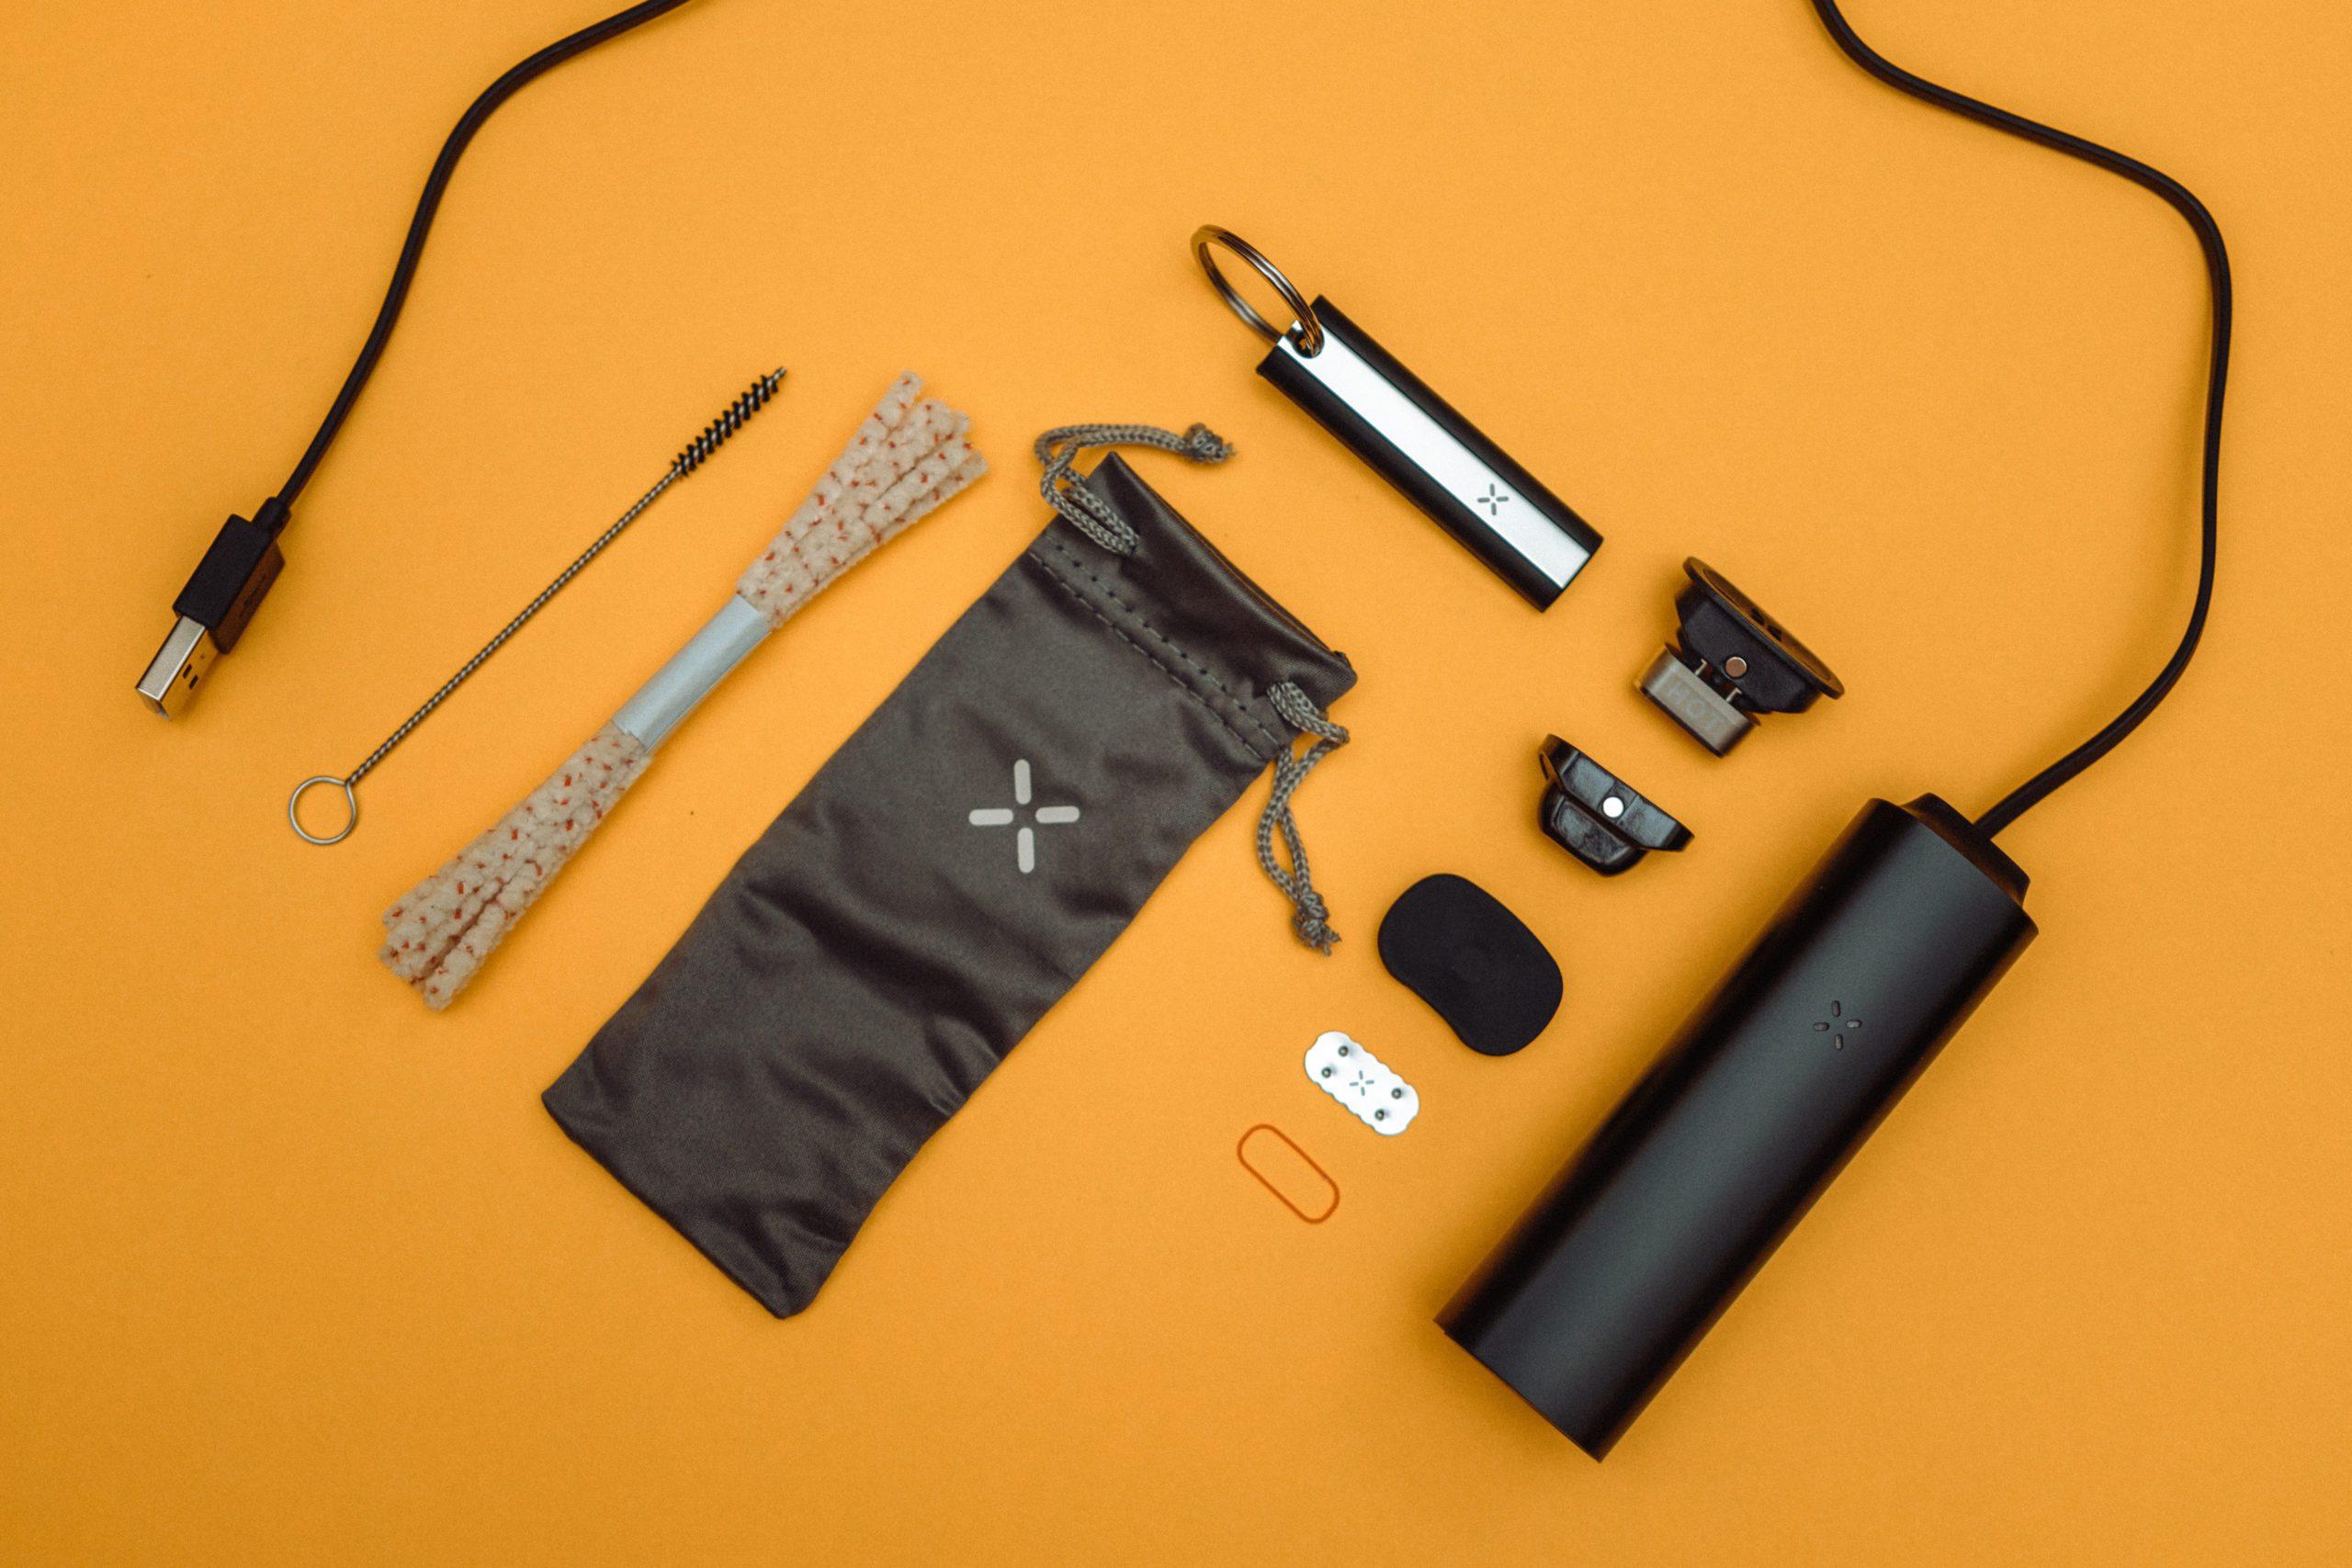 PAX 3 accessories